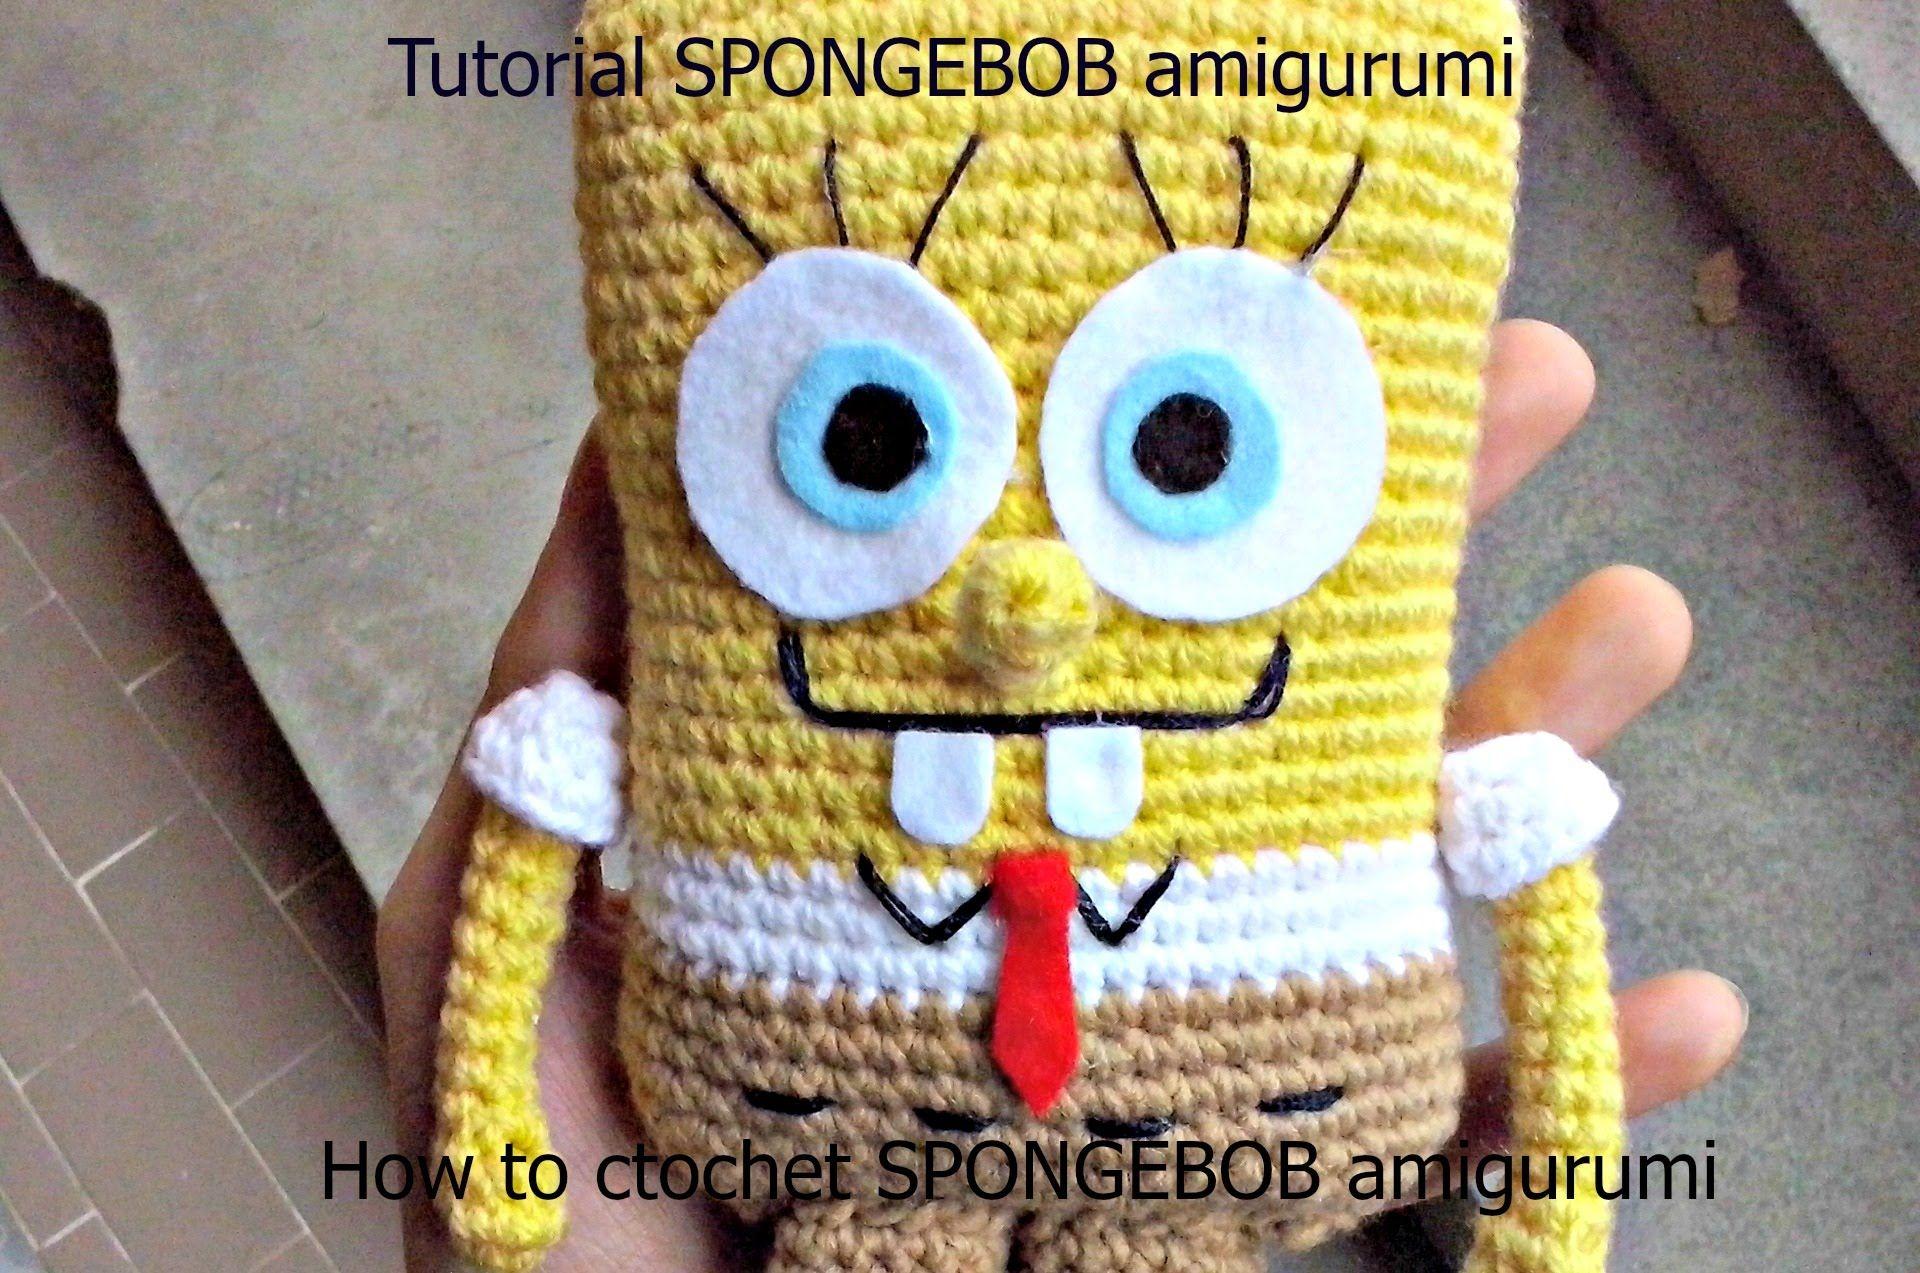 Tutorial SPONGEBOB amigurumi   HOW TO CROCHET SPONGEBOB AMIGURUMI ...